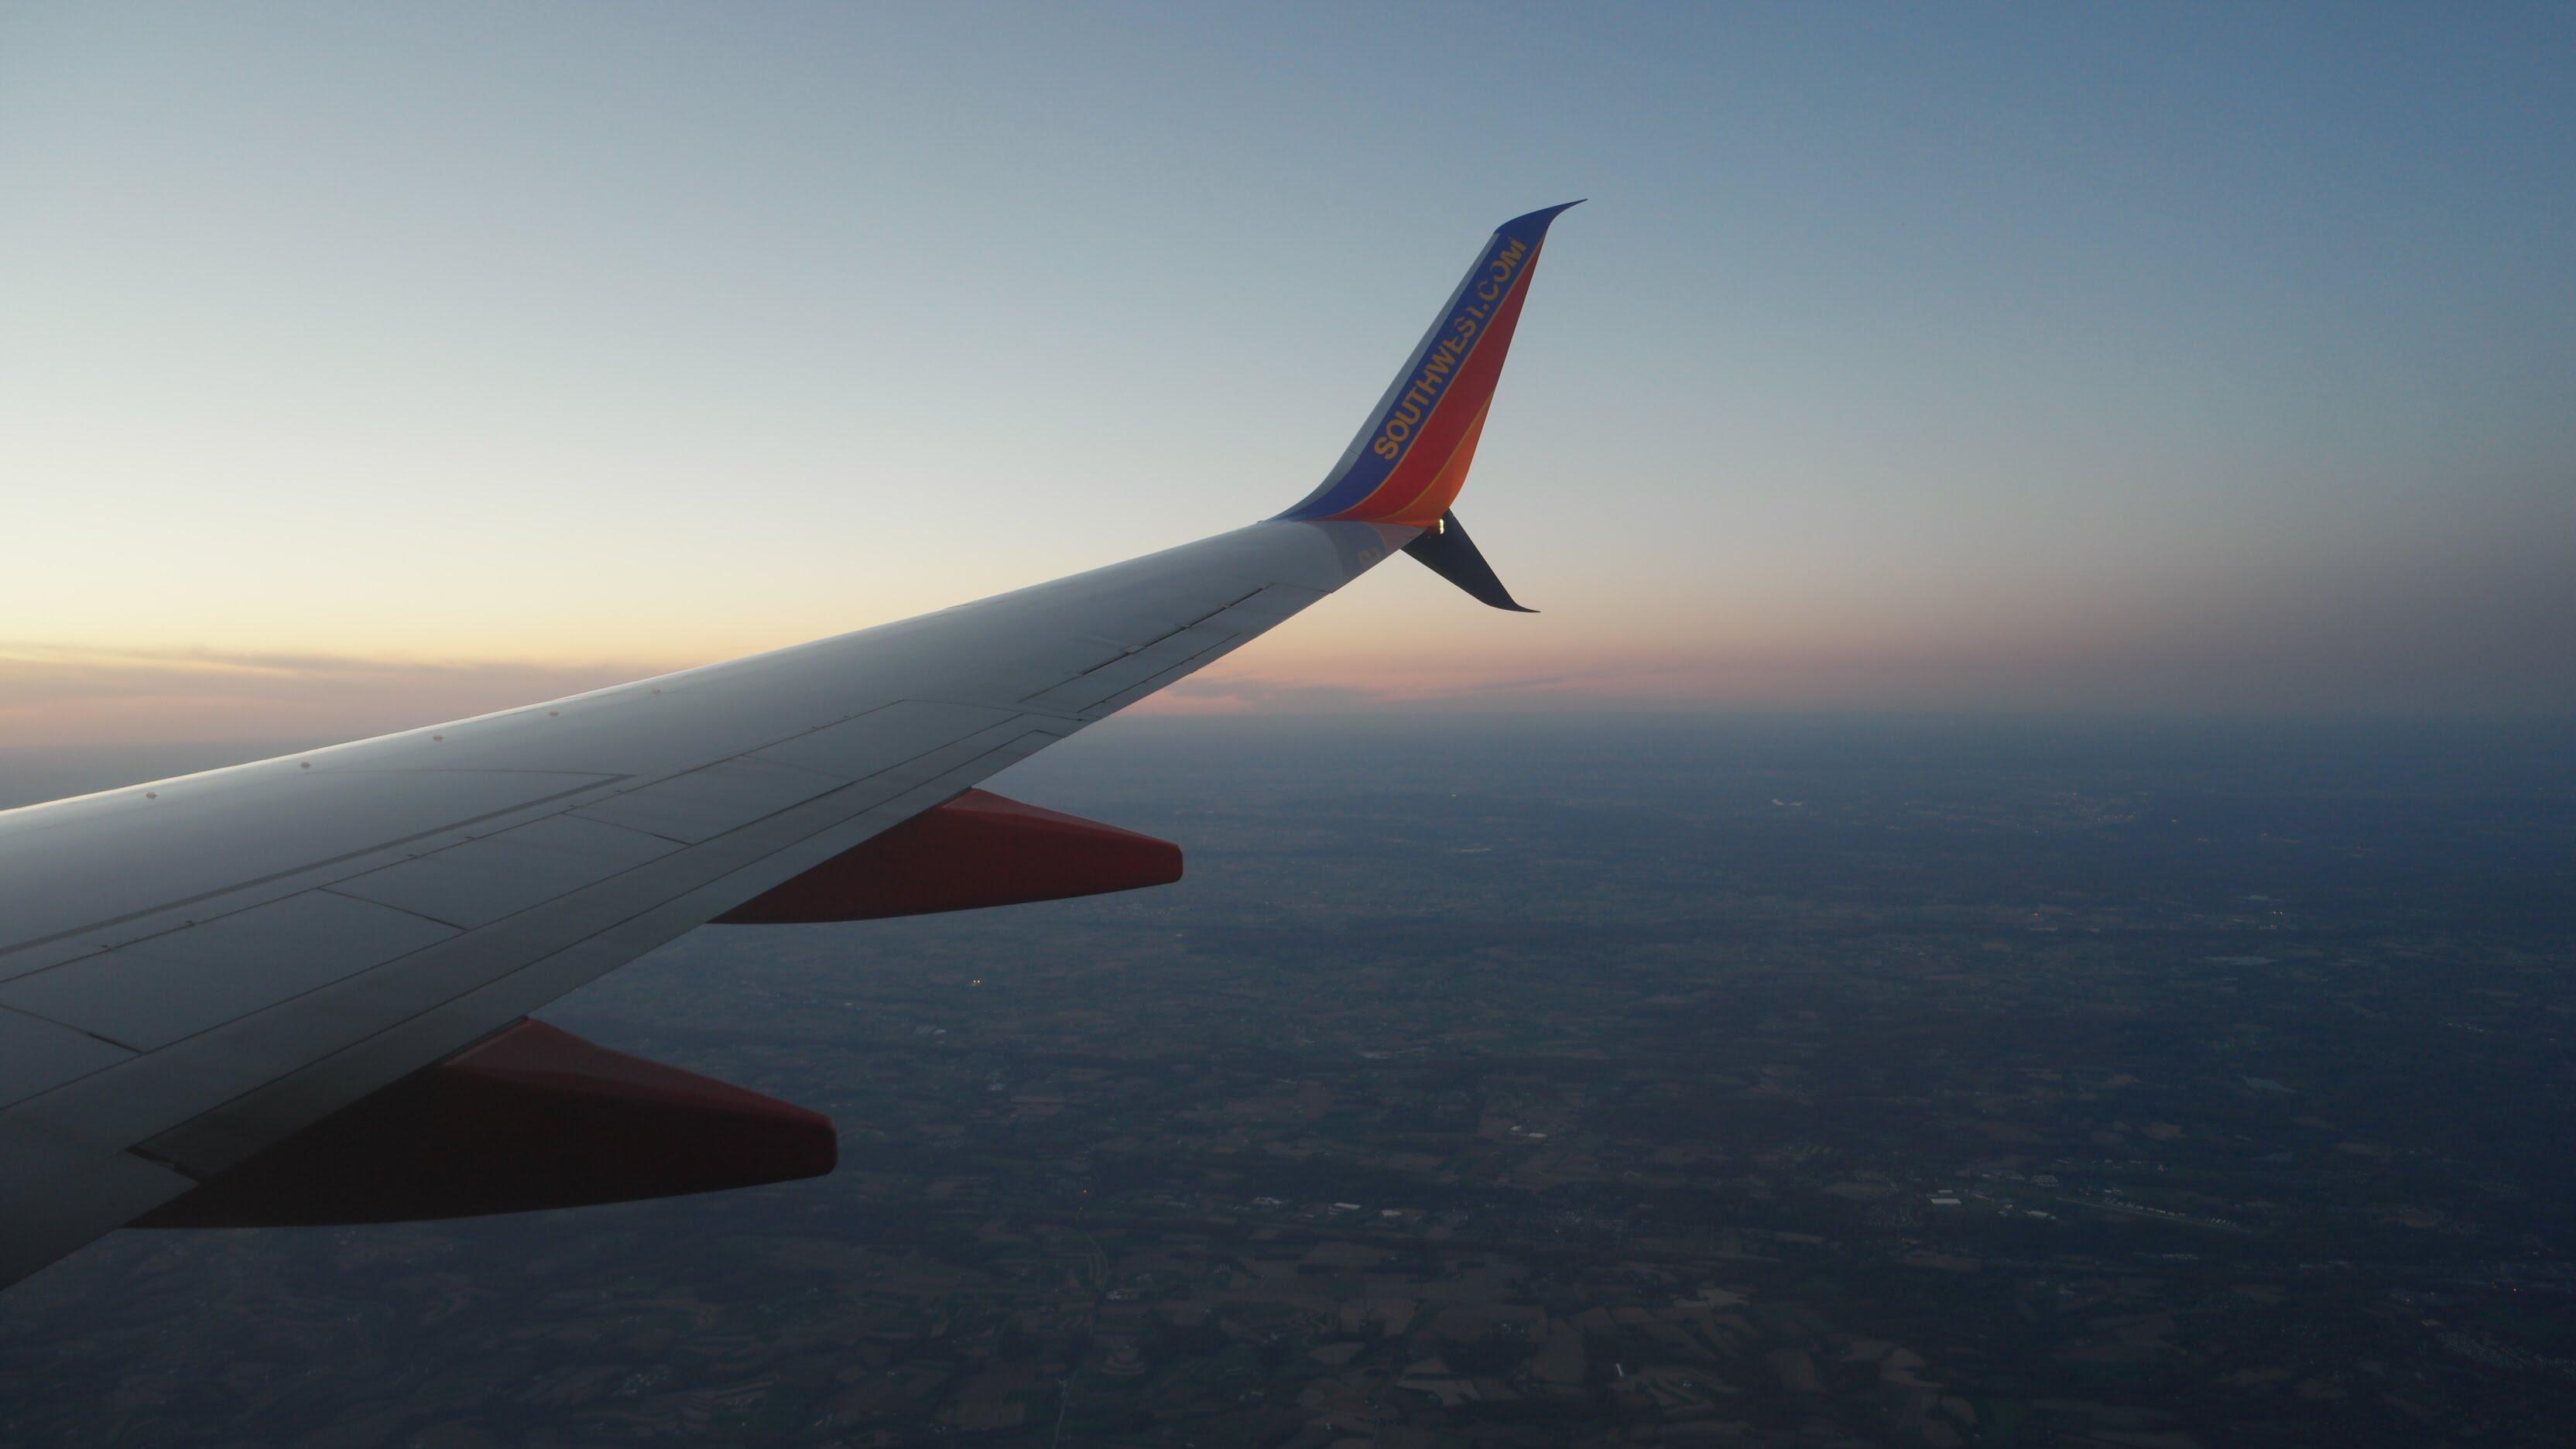 free photo plane trip trip sky nature free download jooinn